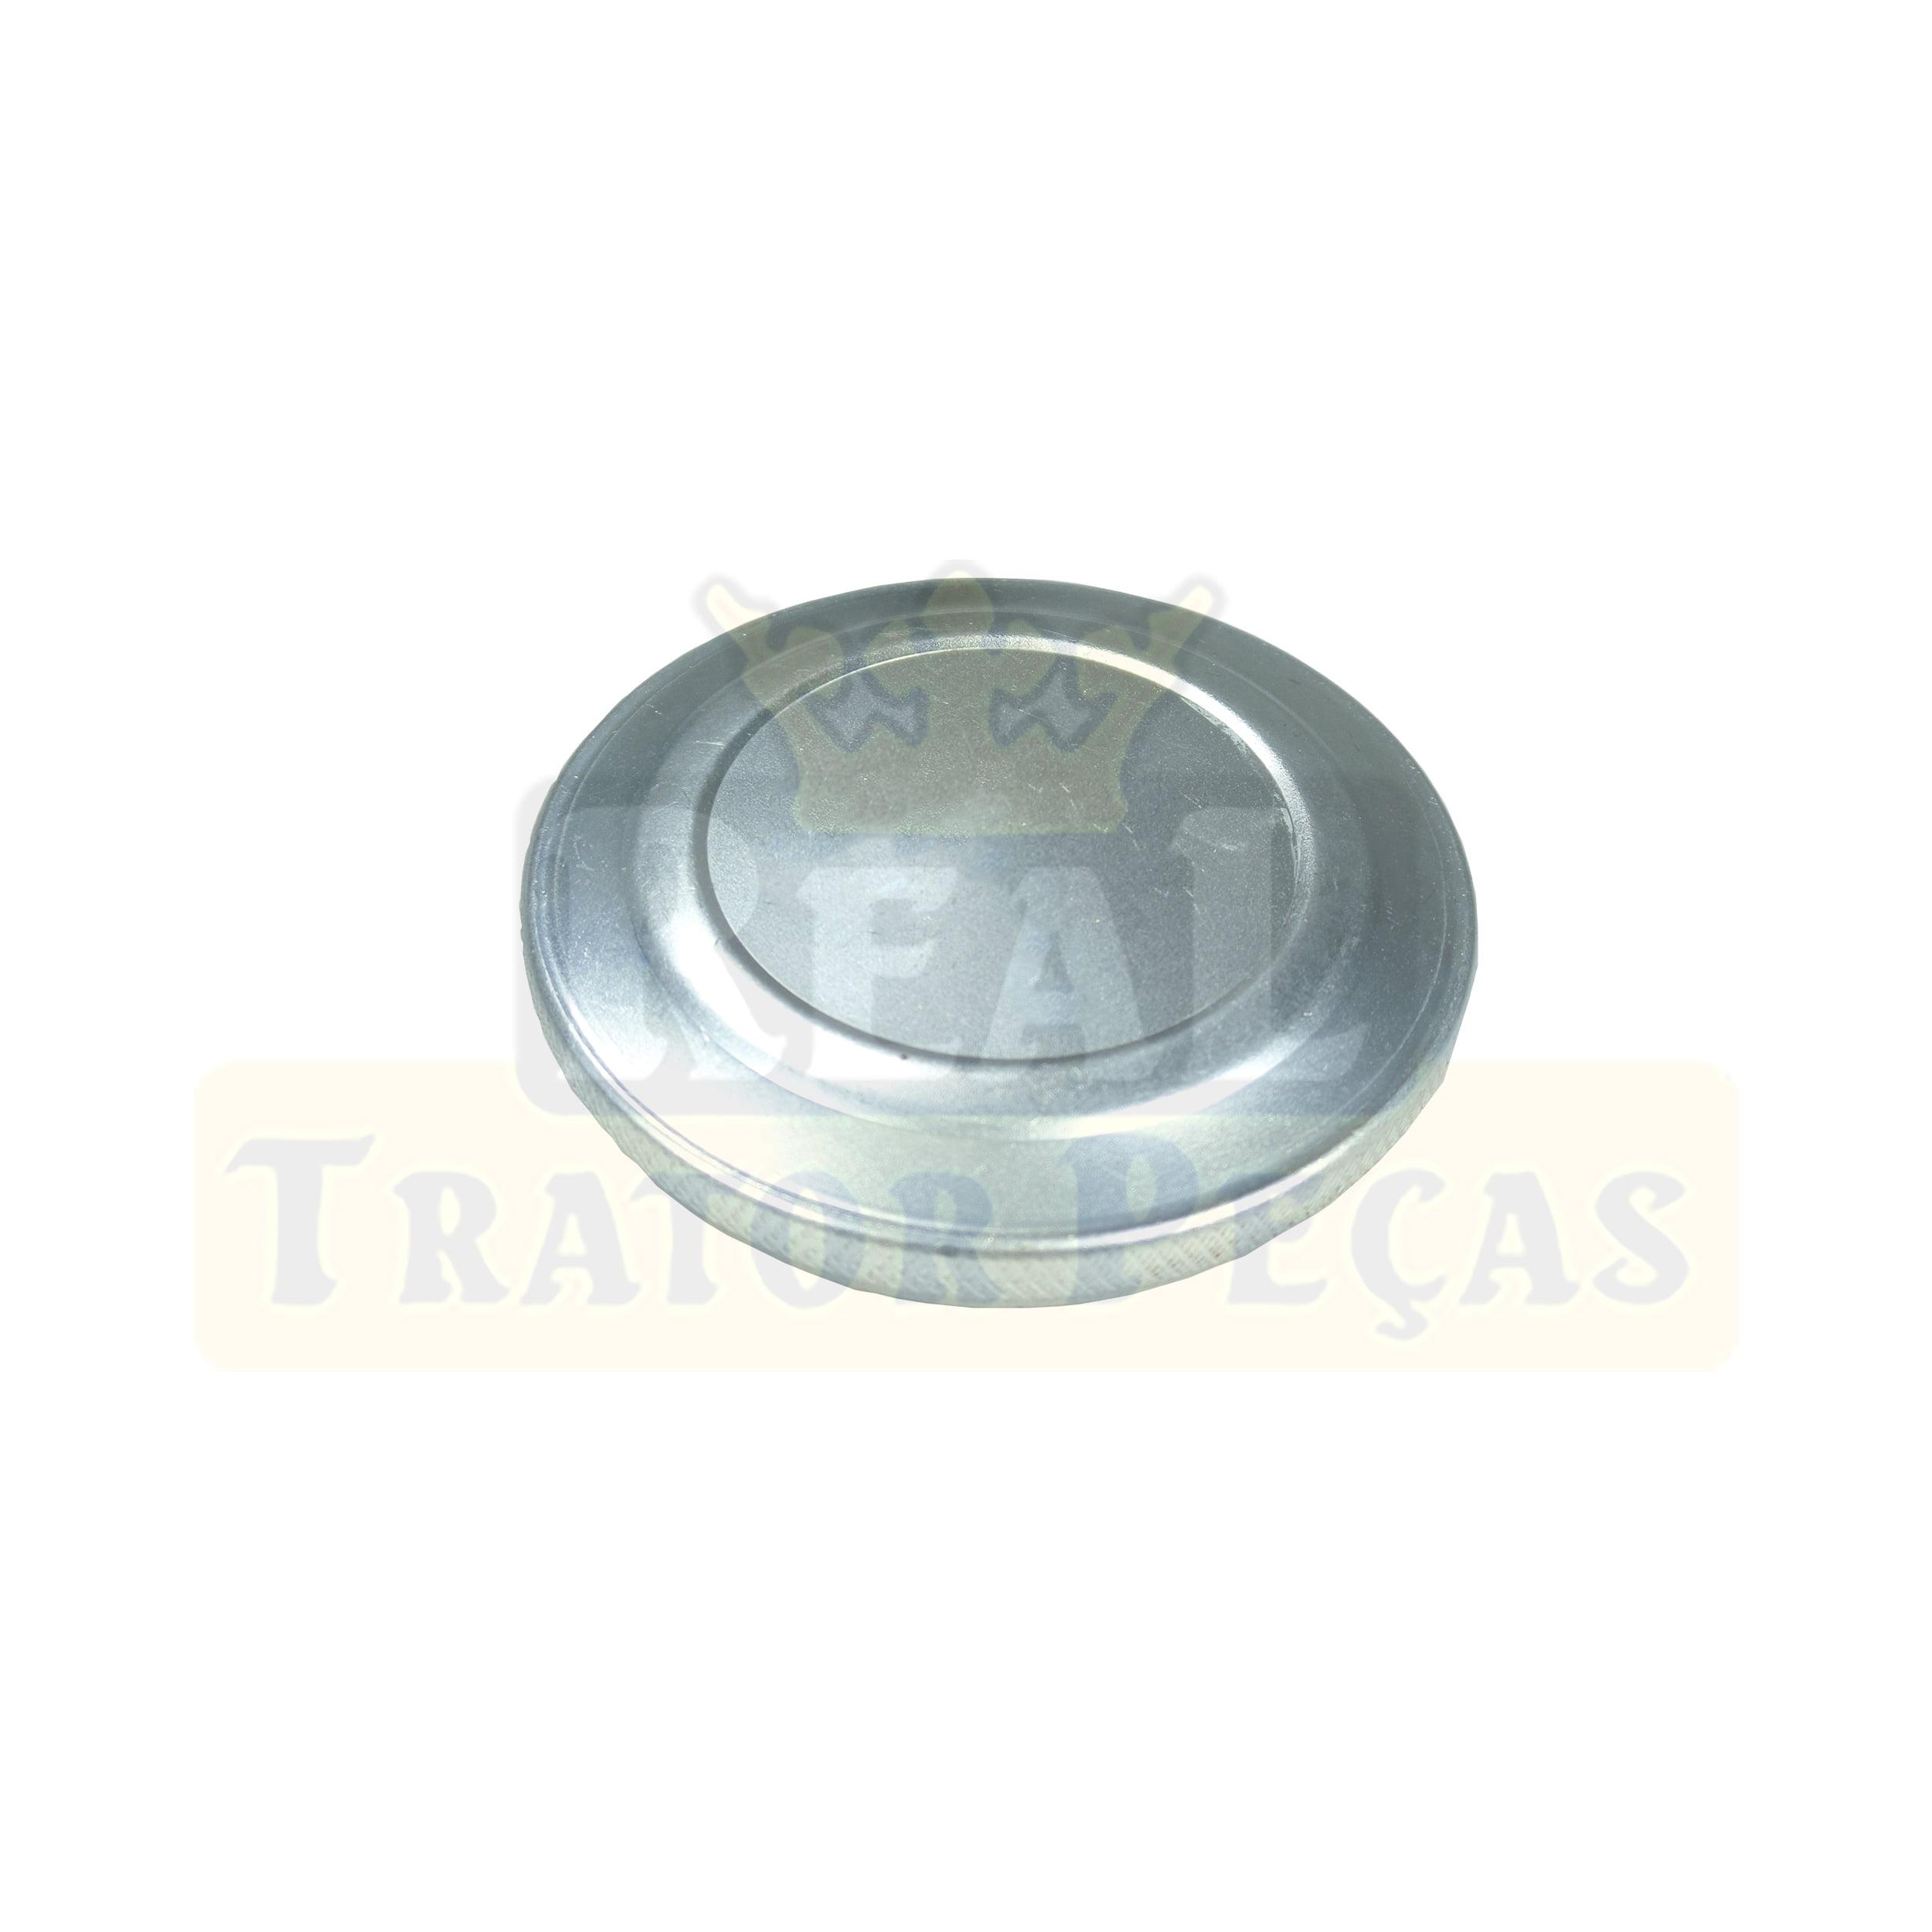 TAMPA TANQUE COMBUSTÍVEL - TRATORES FORD 4610 / 5610 / 6610 / 7610 / 7810 | 4630 / 5630 / 6630 / 7630 | RETROESCAVADEIRA CASE 580H (40MM)